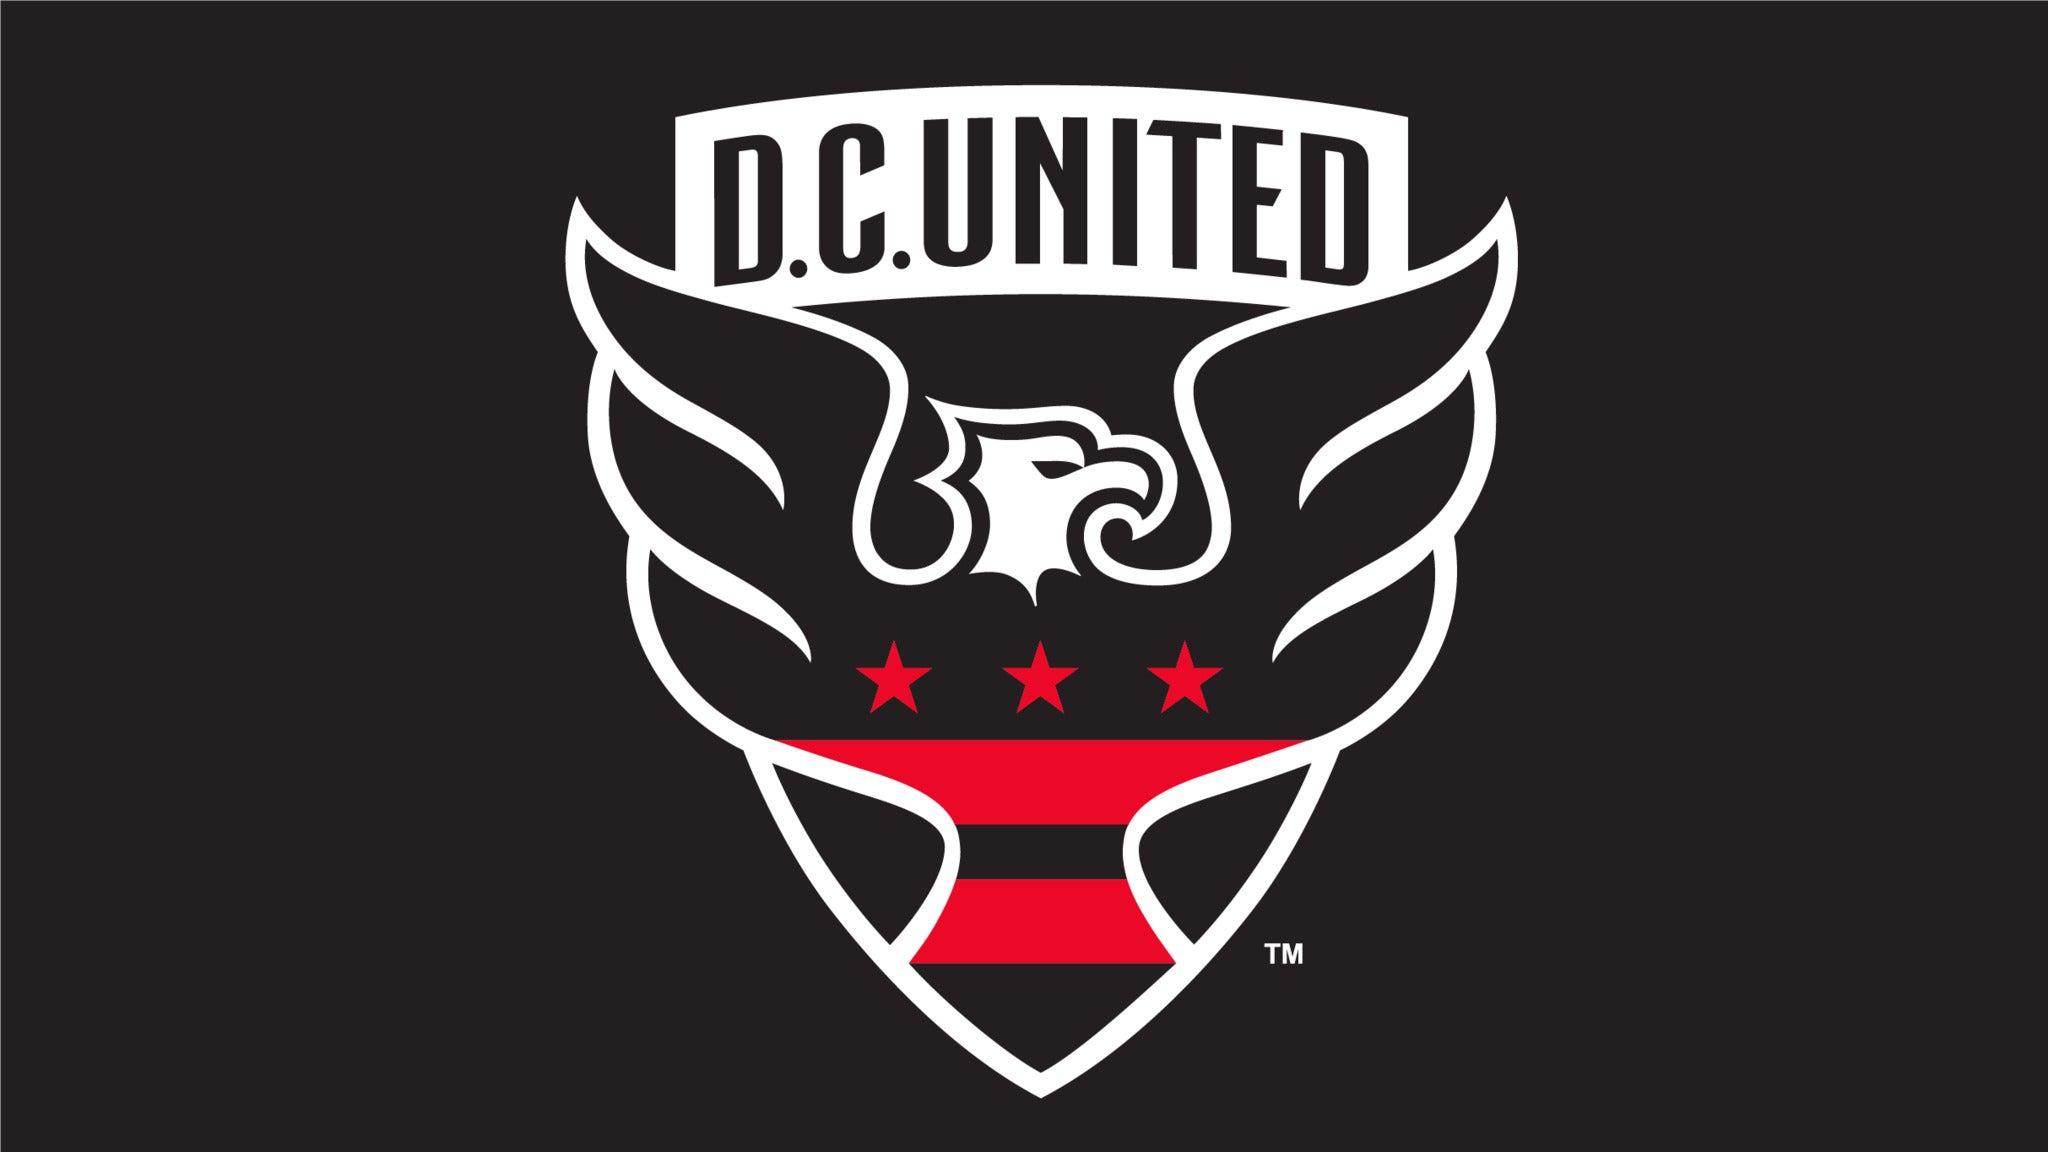 D.C. UNITED vs. Chicago Fire at RFK Stadium - Washington, DC 20003